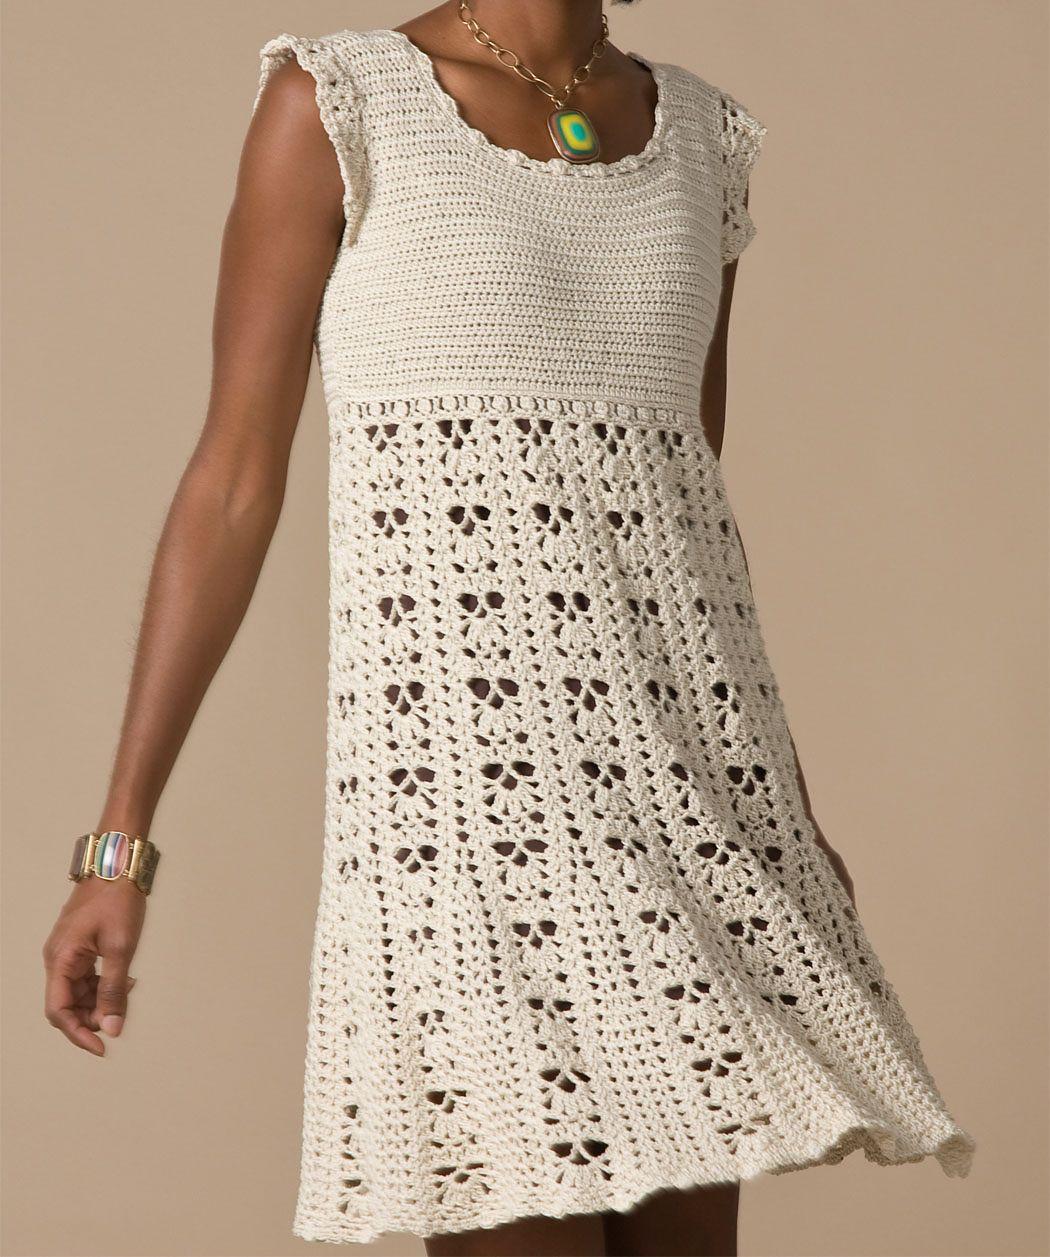 Ravelry: Crochet Dress by Gayle Bunn | Crochet | Pinterest ...